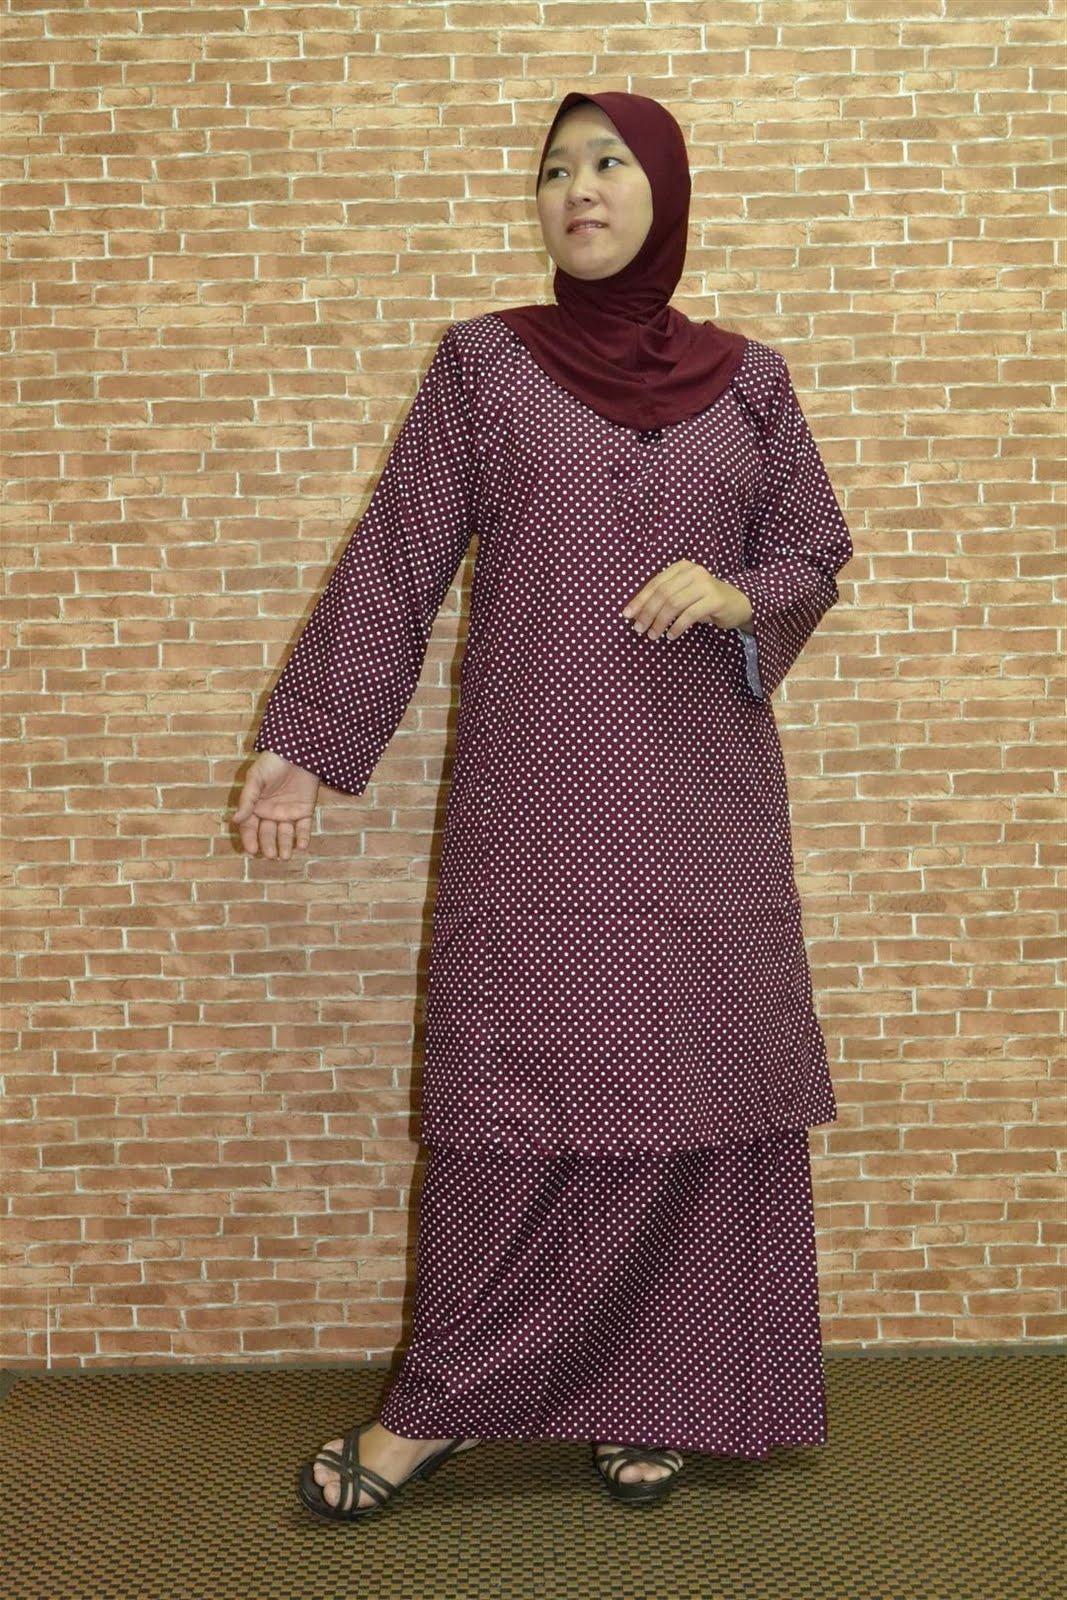 Baju Kurung Moden Hari Raya 2013 | HAIRSTYLE GALLERY